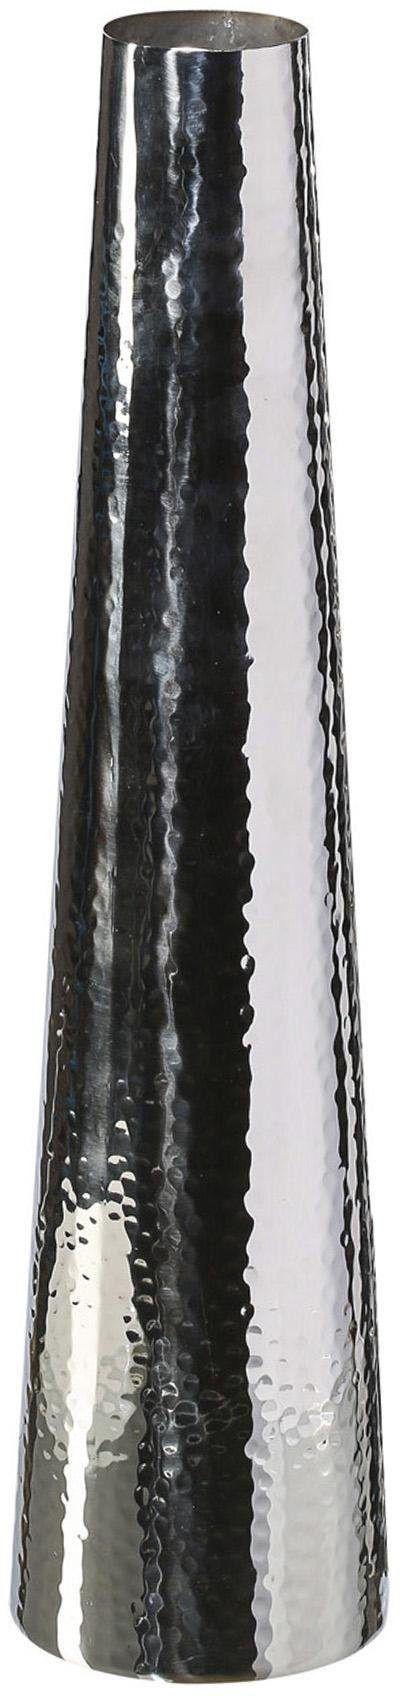 Vase silber, yourhome Jetzt bestellen unter: https://moebel.ladendirekt.de/dekoration/vasen/tischvasen/?uid=1939be2a-ffd7-5727-b576-efce0faf65a6&utm_source=pinterest&utm_medium=pin&utm_campaign=boards #tischvasen #vasen #dekoration